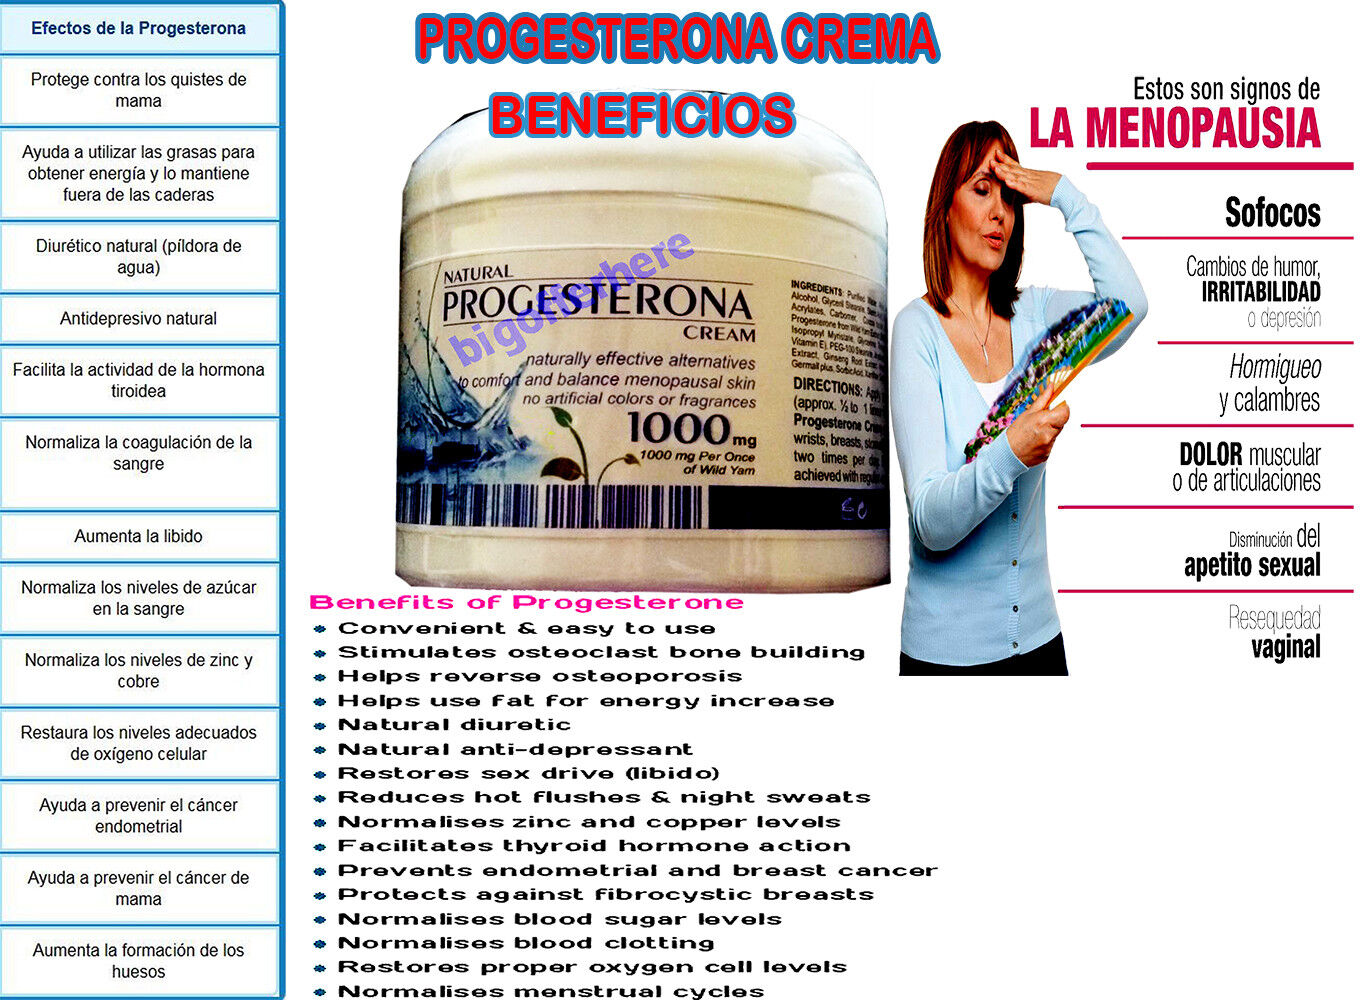 Natural Progesterone 1000mg Cream Xtra strength USP certific